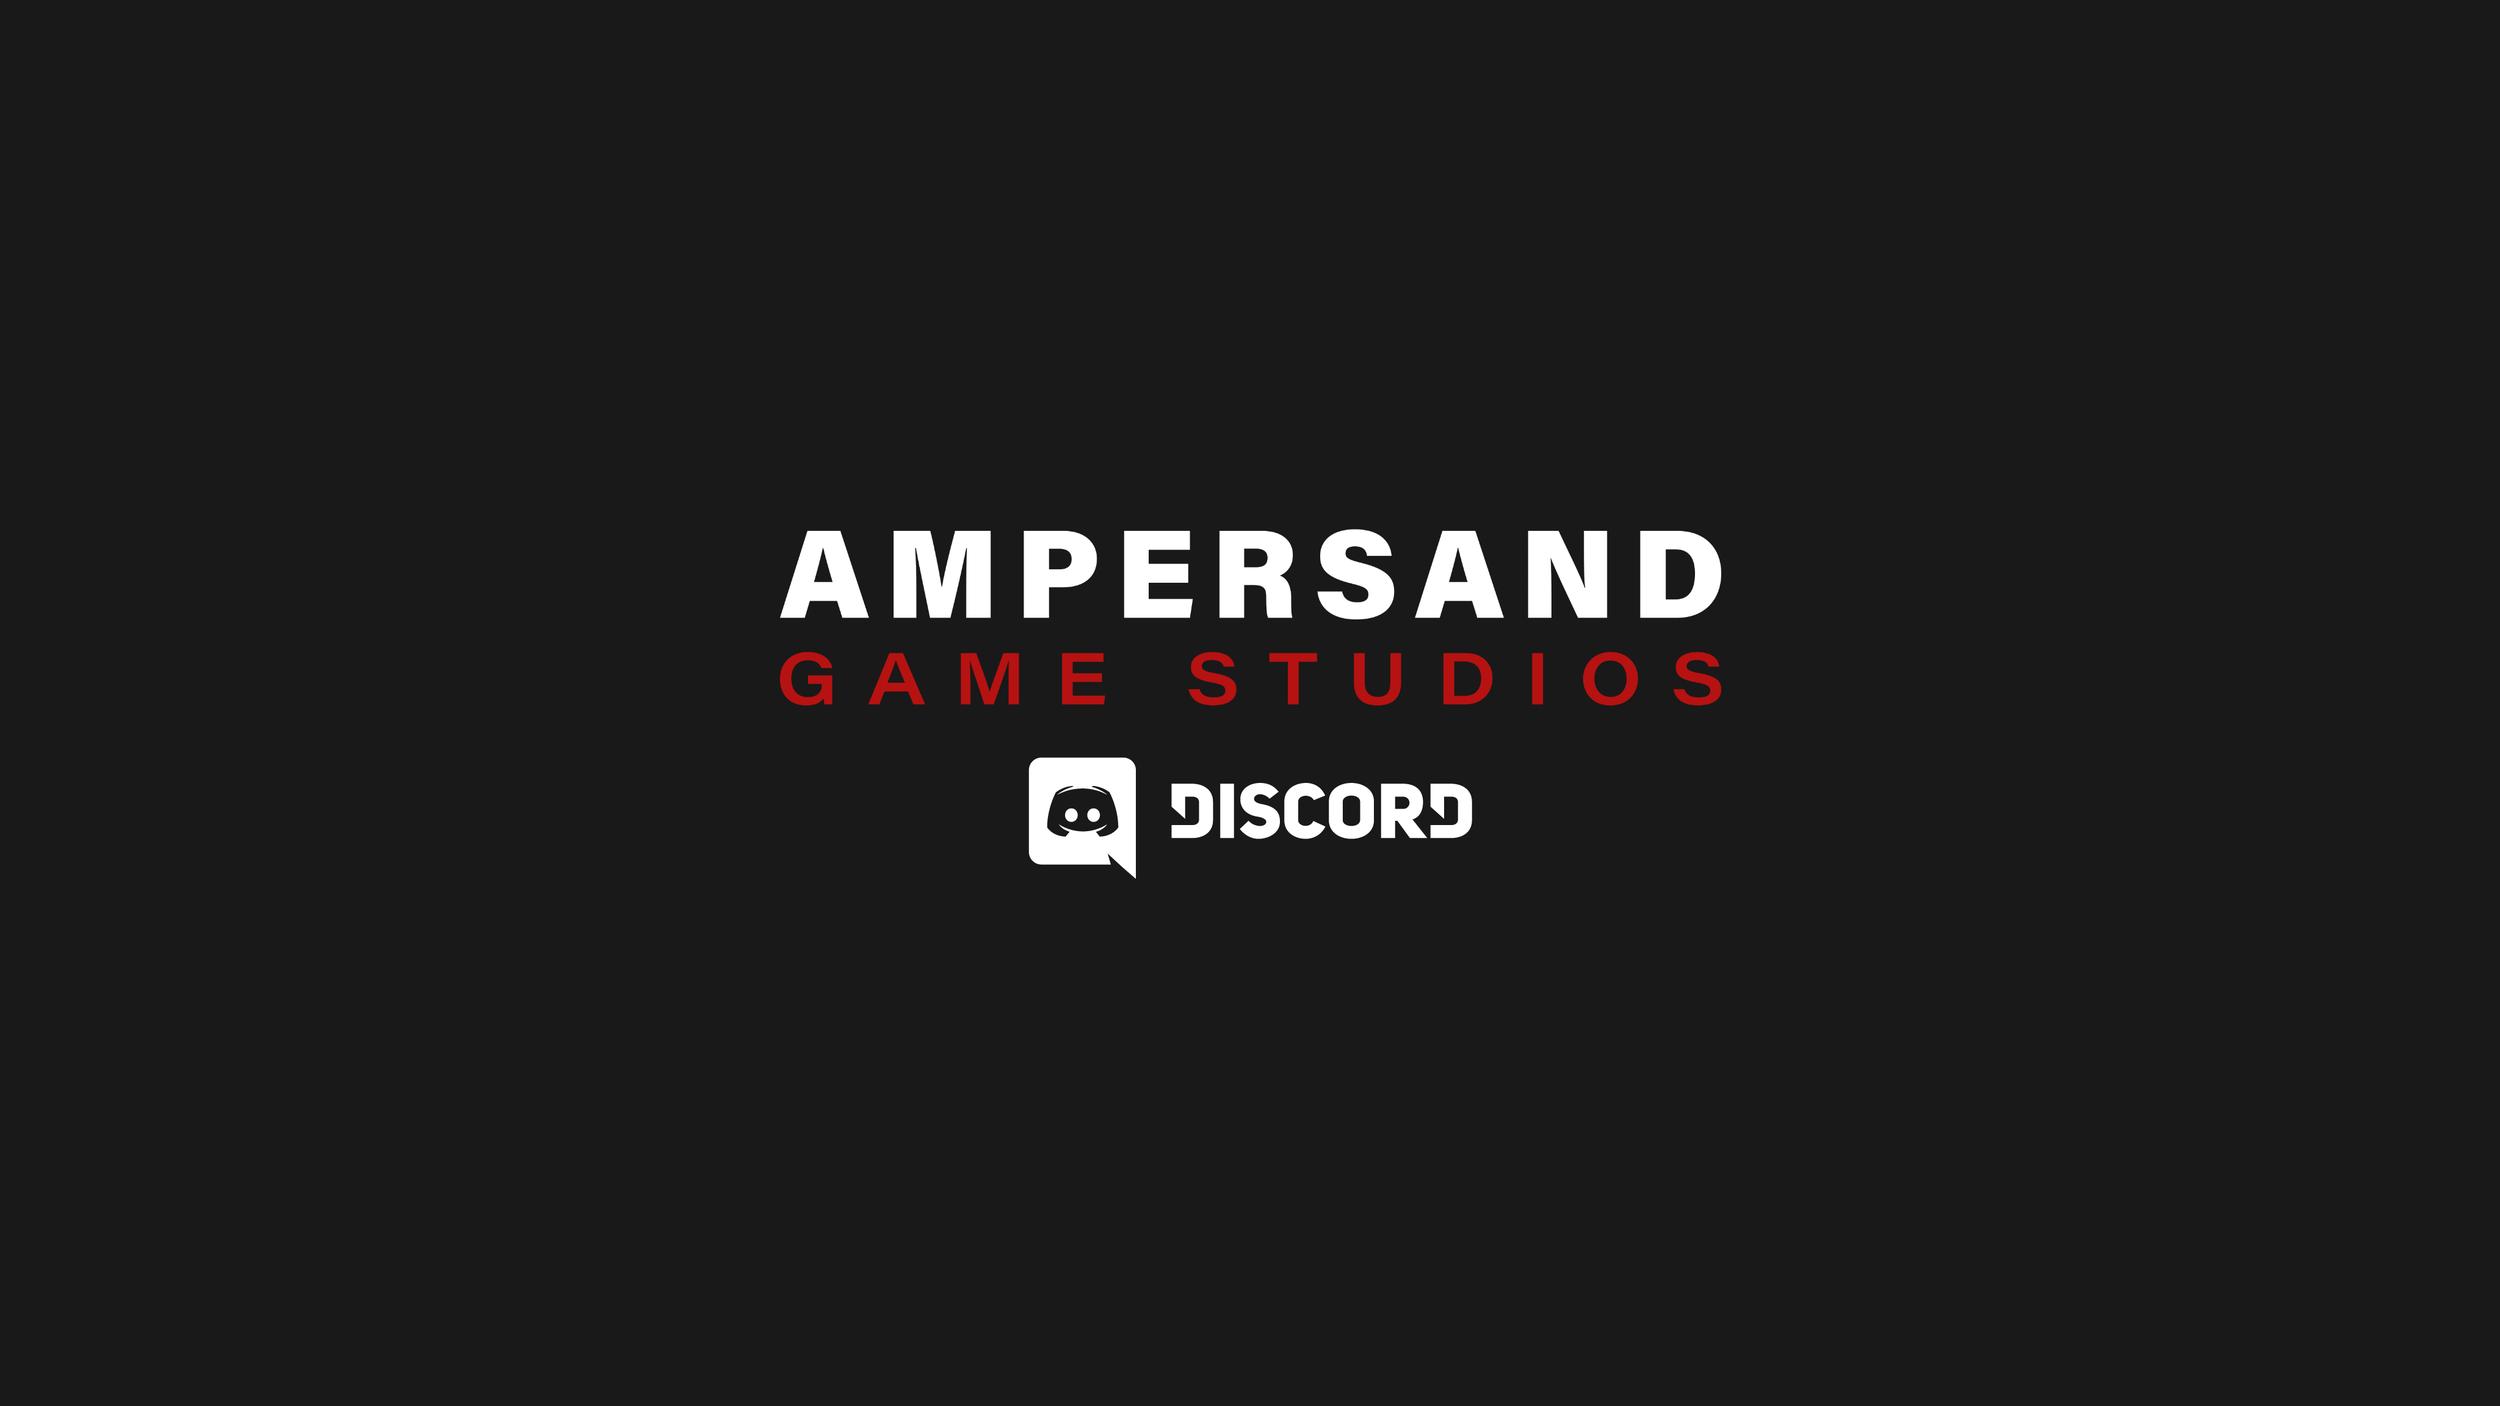 ampersandgamestudios_discord_banner.png